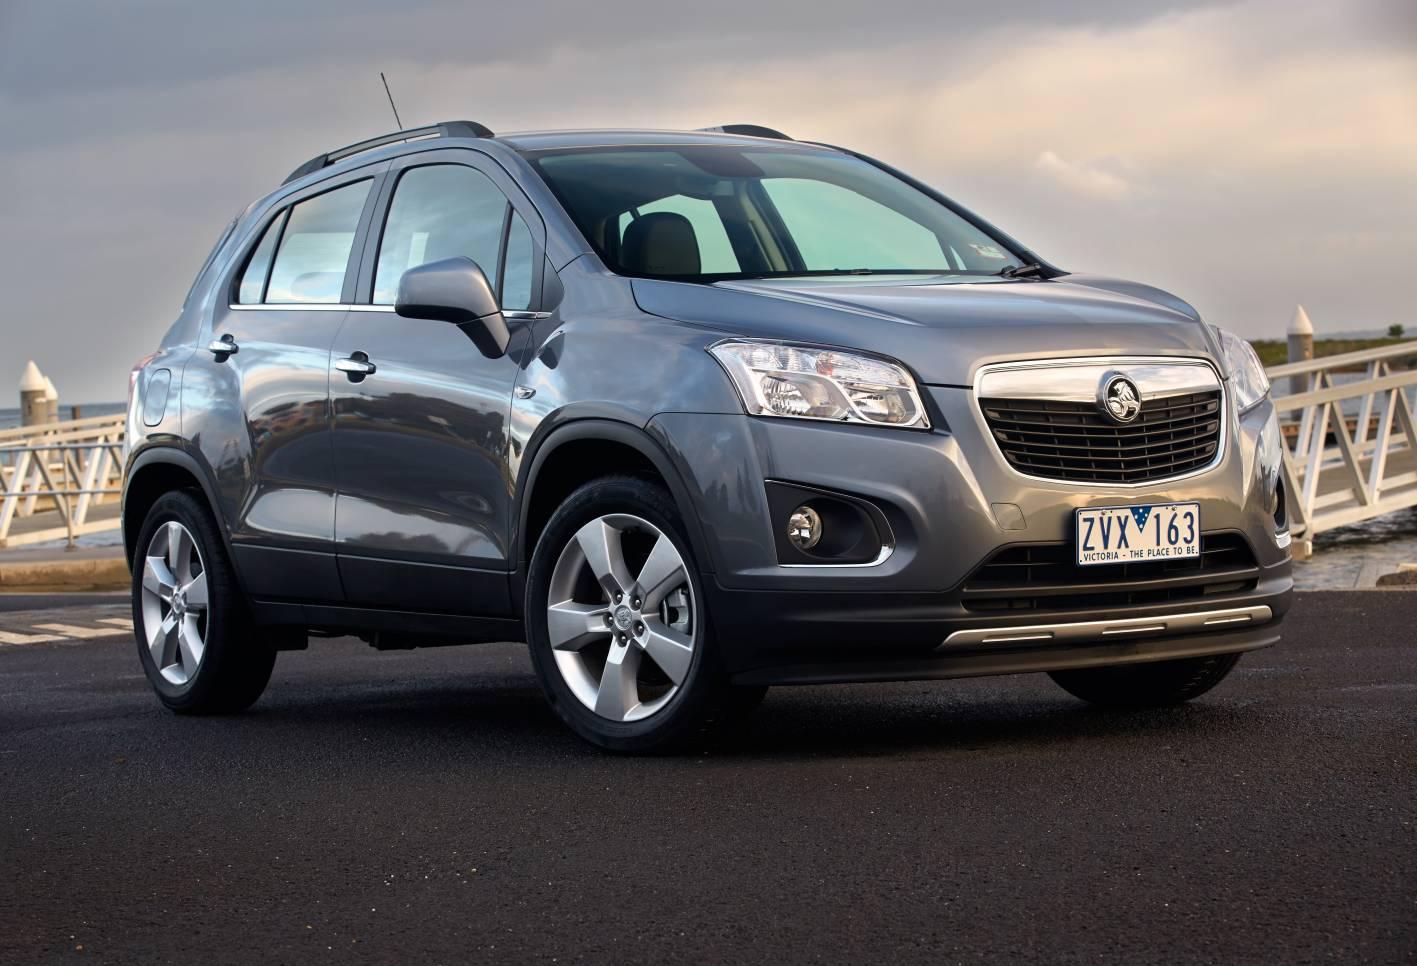 2013-Holden-Trax-LTZ-exterior-front-quarter1 - ForceGT.com